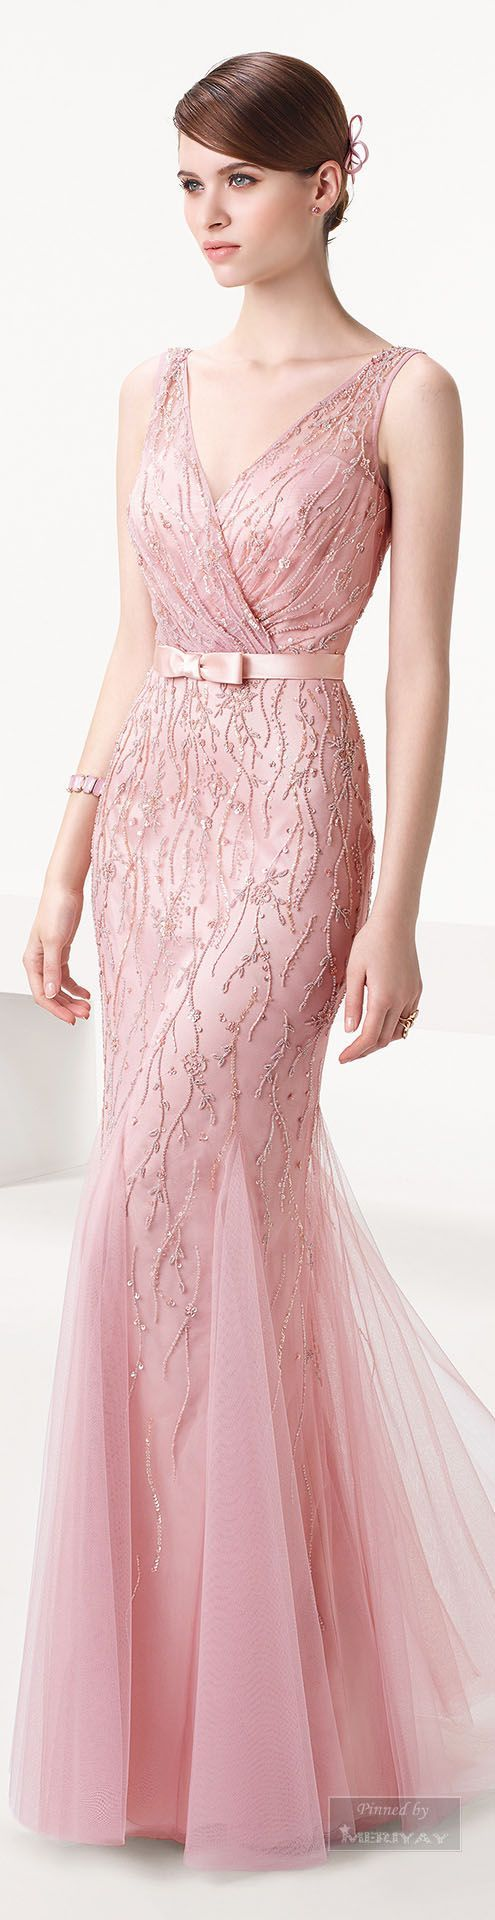 Soft Pink Wedding LovelyIdeas | Fashion | Pinterest | Vestiditos ...